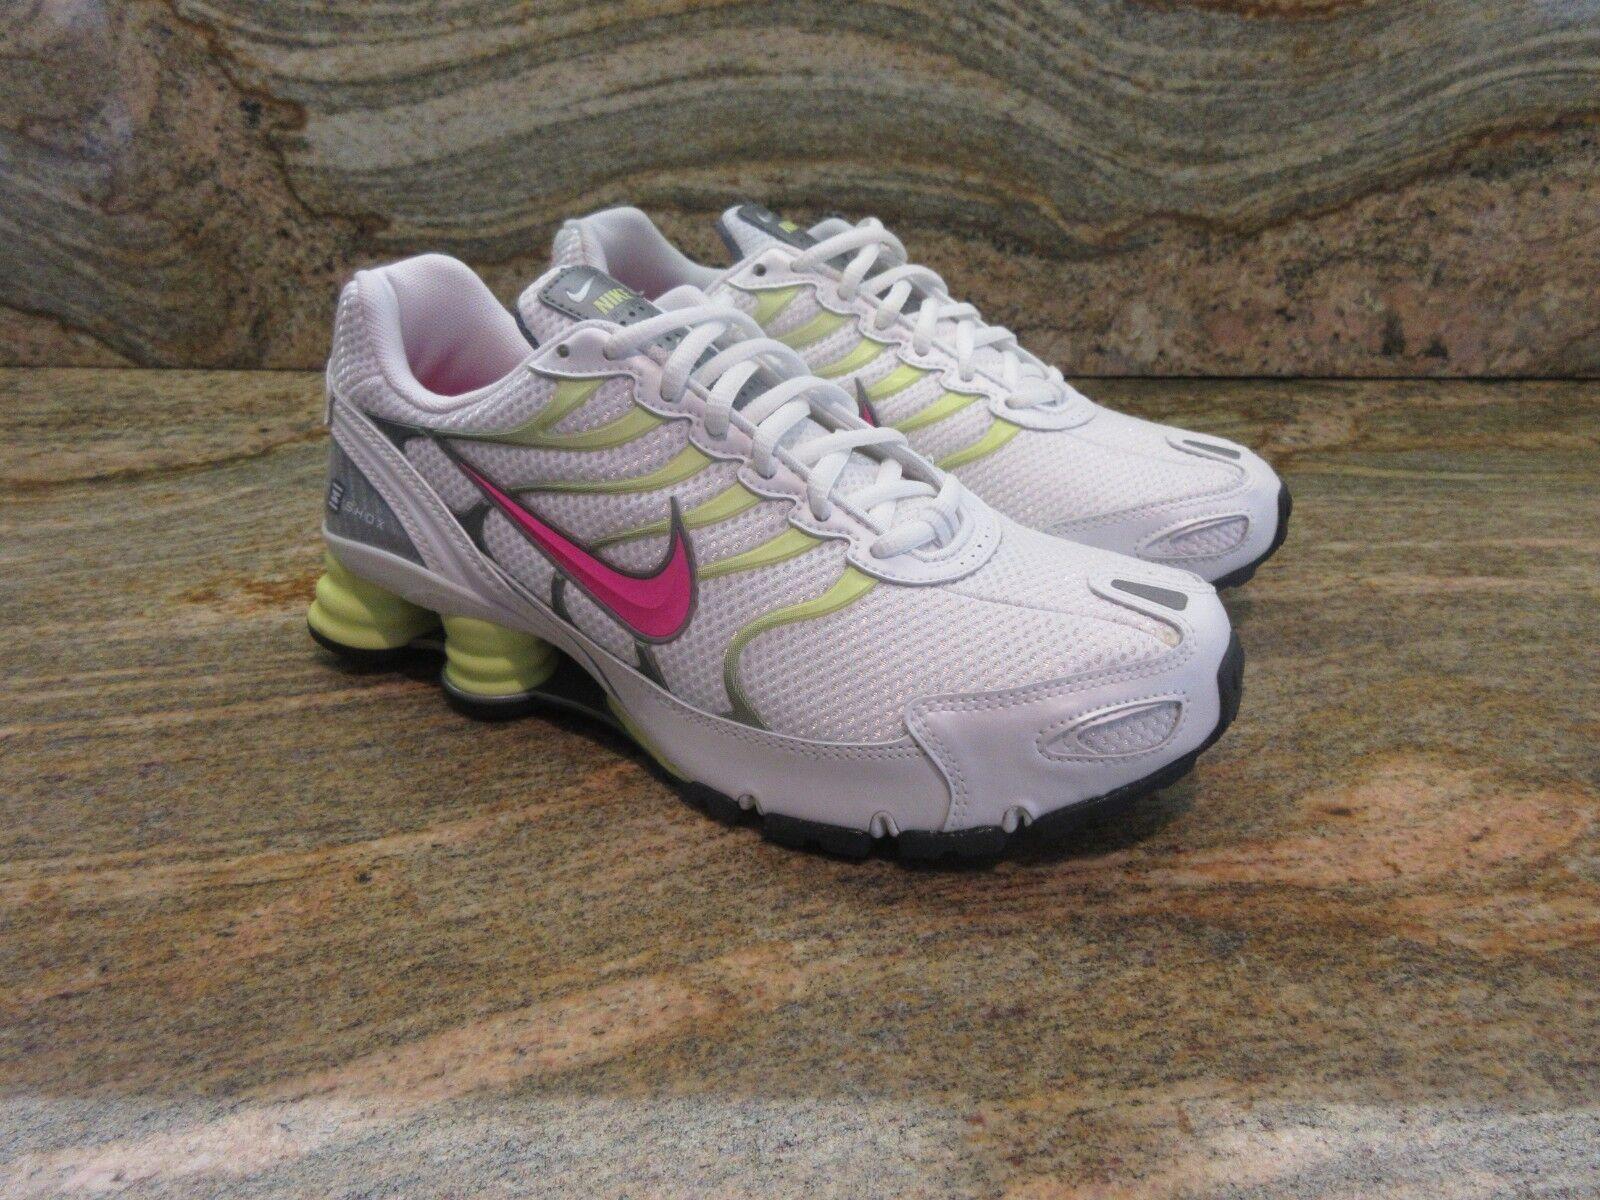 2008 WMNS Nike Shox Turbo+ VI 6 SZ 9.5 blanc Cherry Lime Cool gris 318164-163